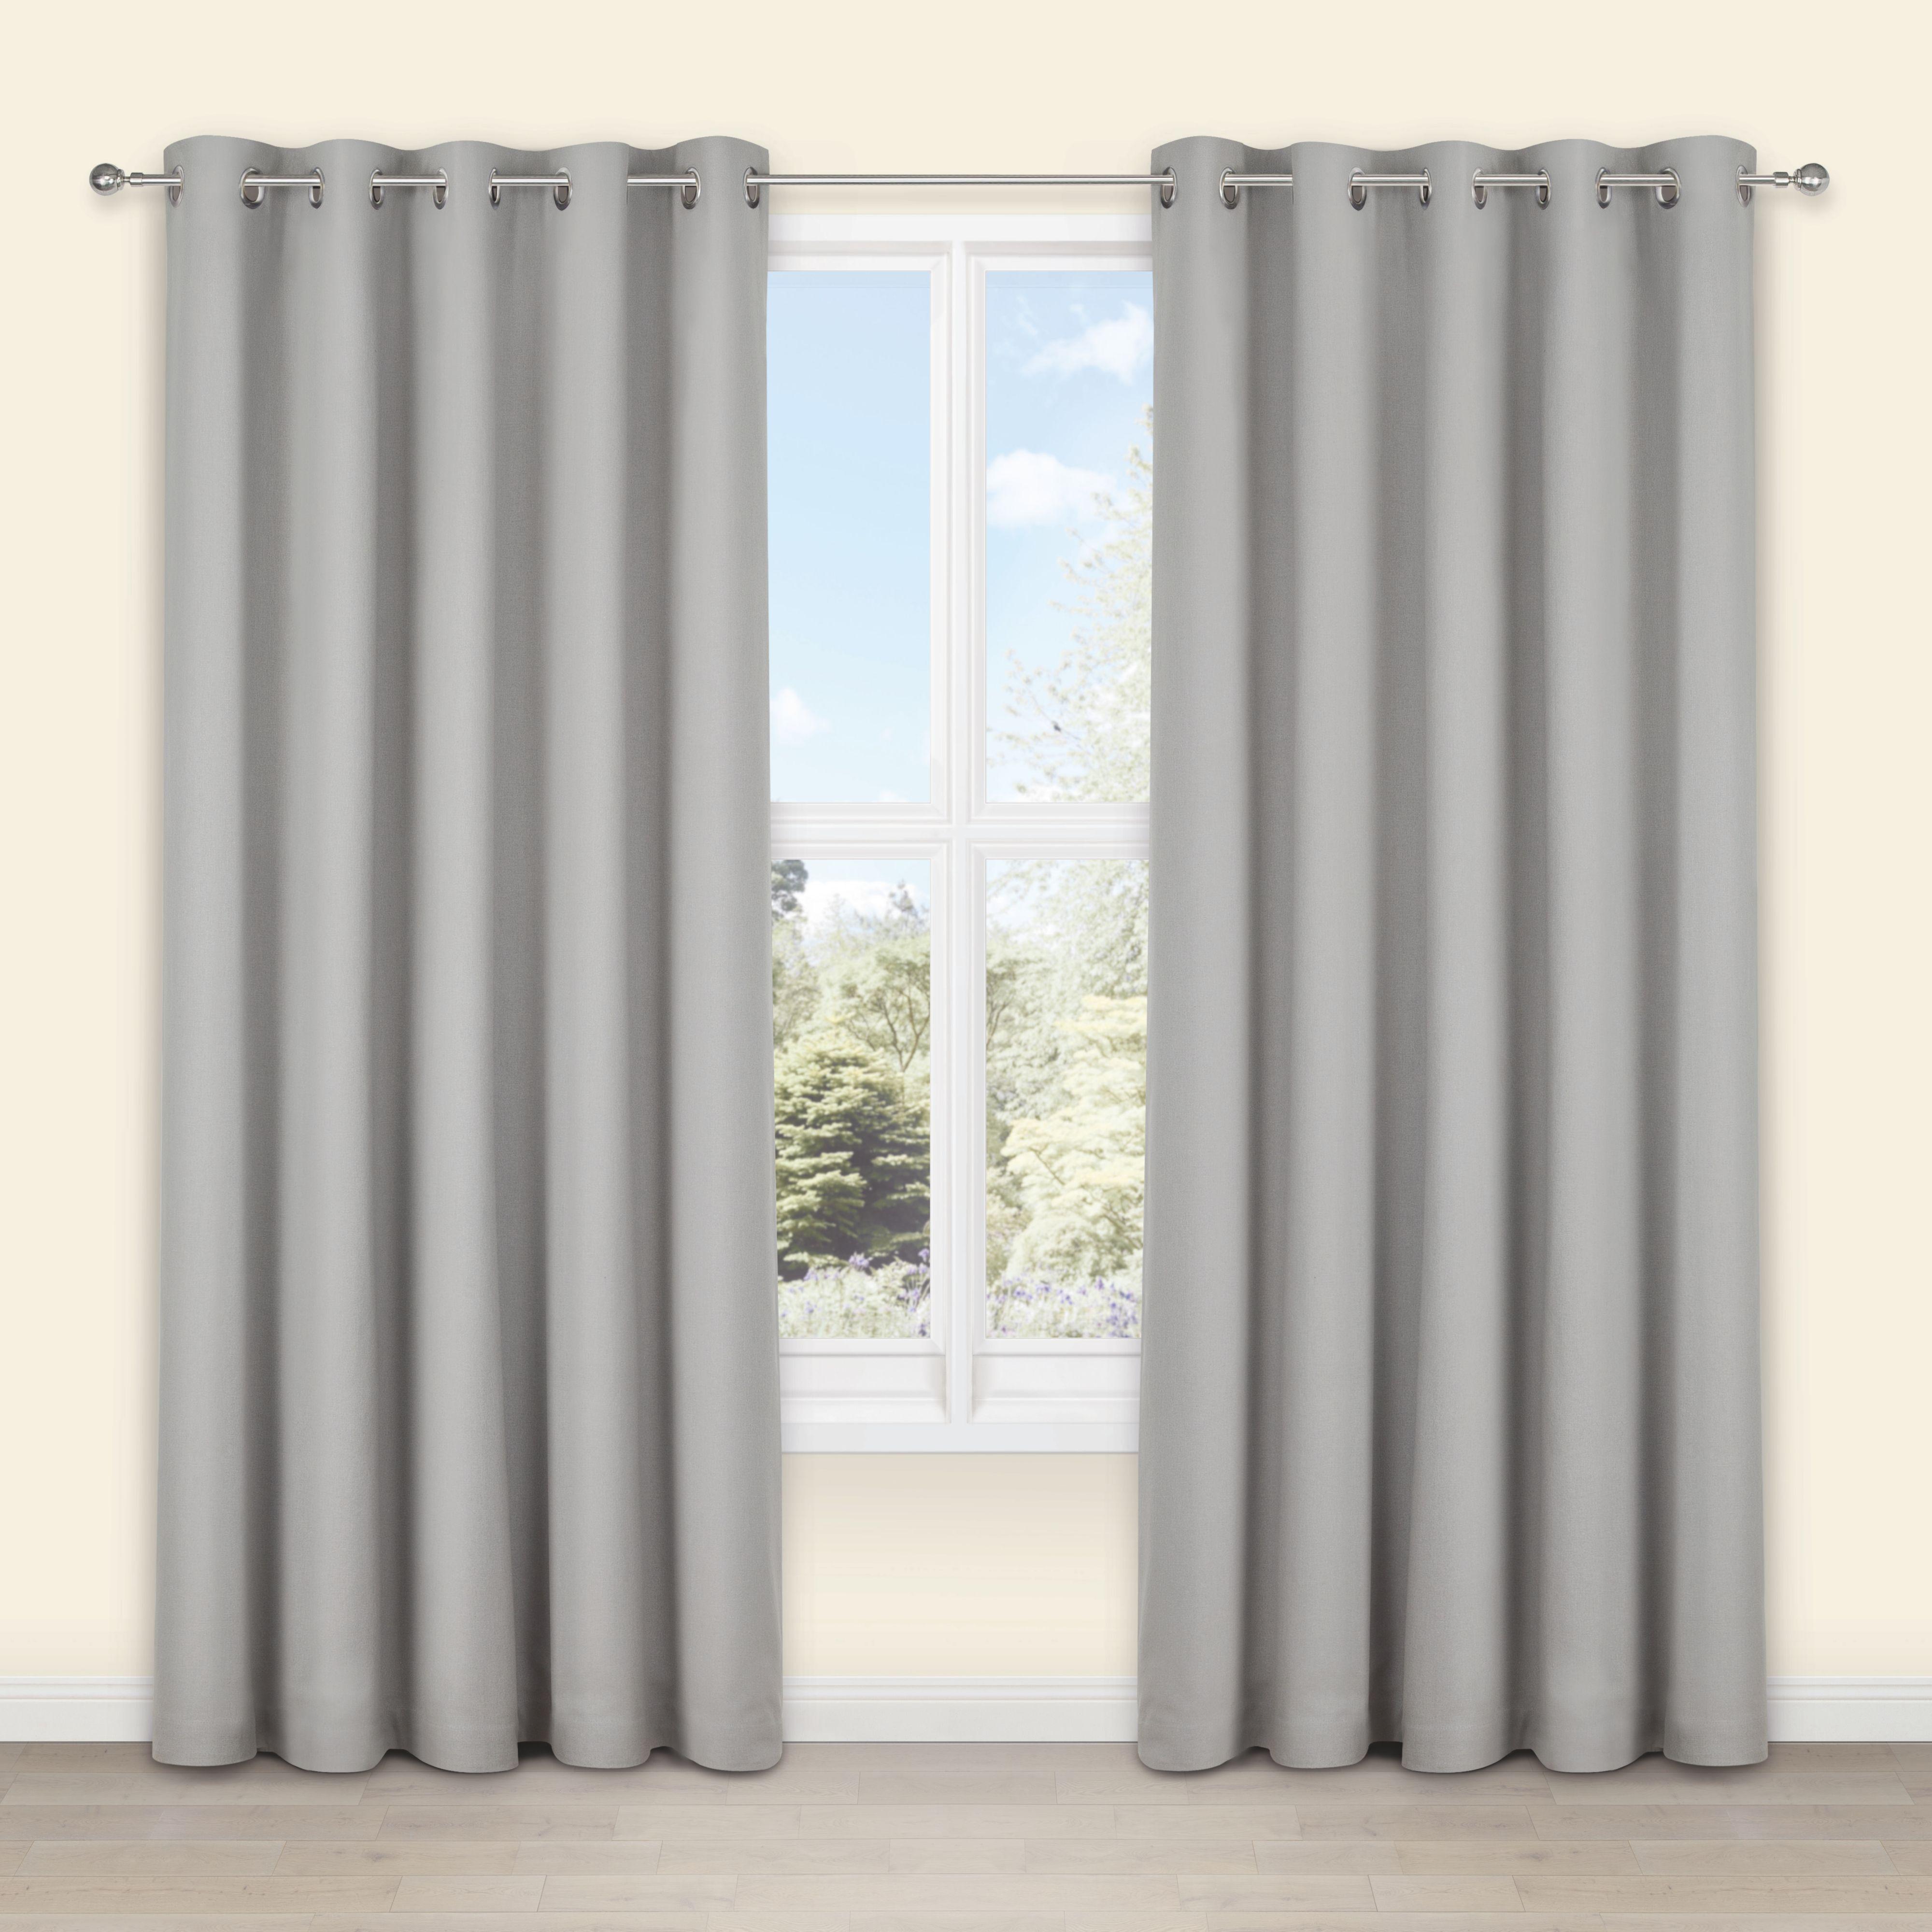 Salla concrete plain woven eyelet lined curtains wcm lcm